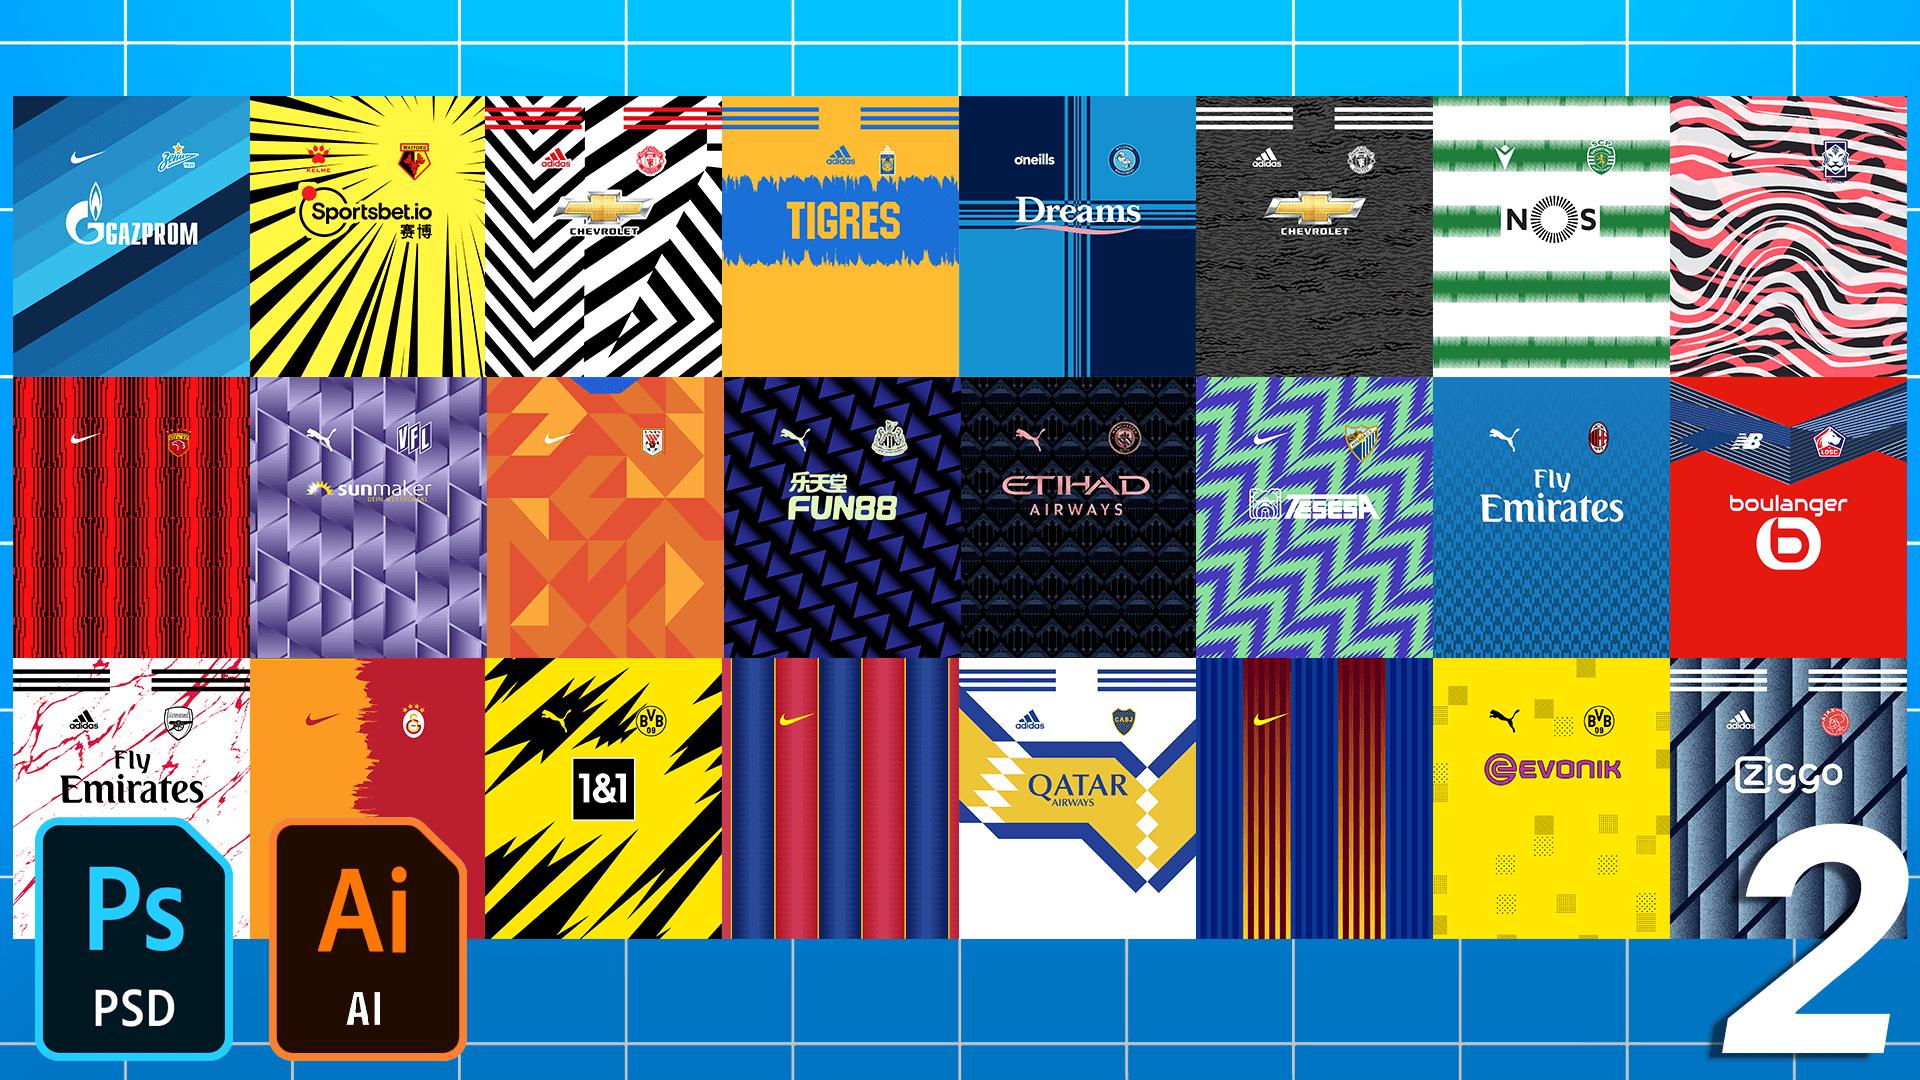 Football/Soccer Jersey Patterns Pack 2020-2021 – Part 2